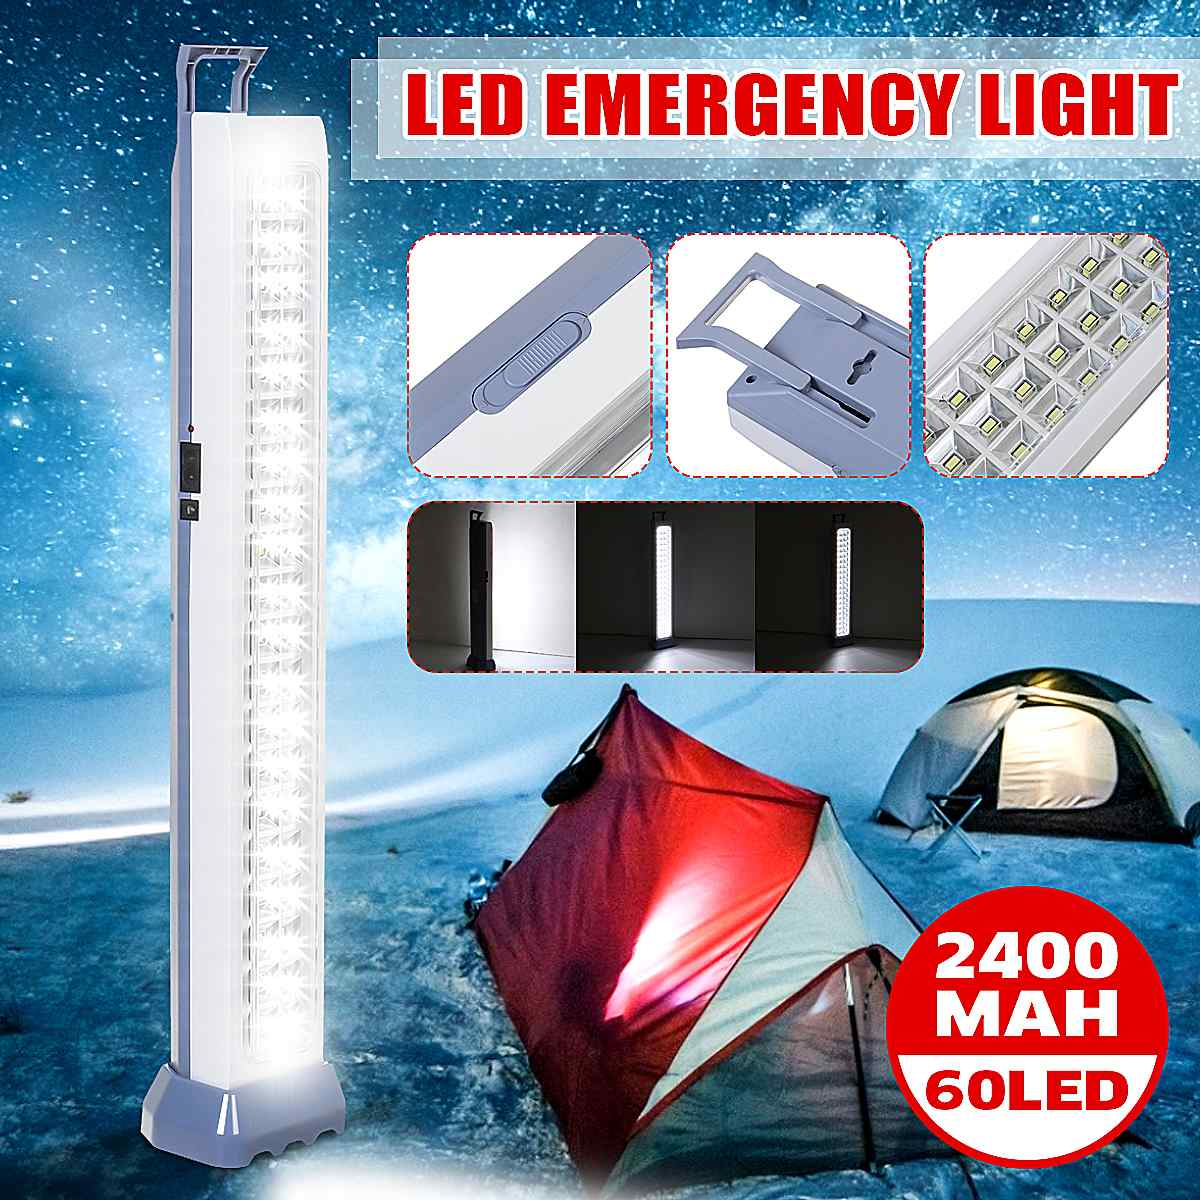 60 luces LED de emergencia para acampada, luz de emergencia recargable para exteriores con 2 modos de luz para trabajo, lámpara para senderismo, estacionamiento en casa